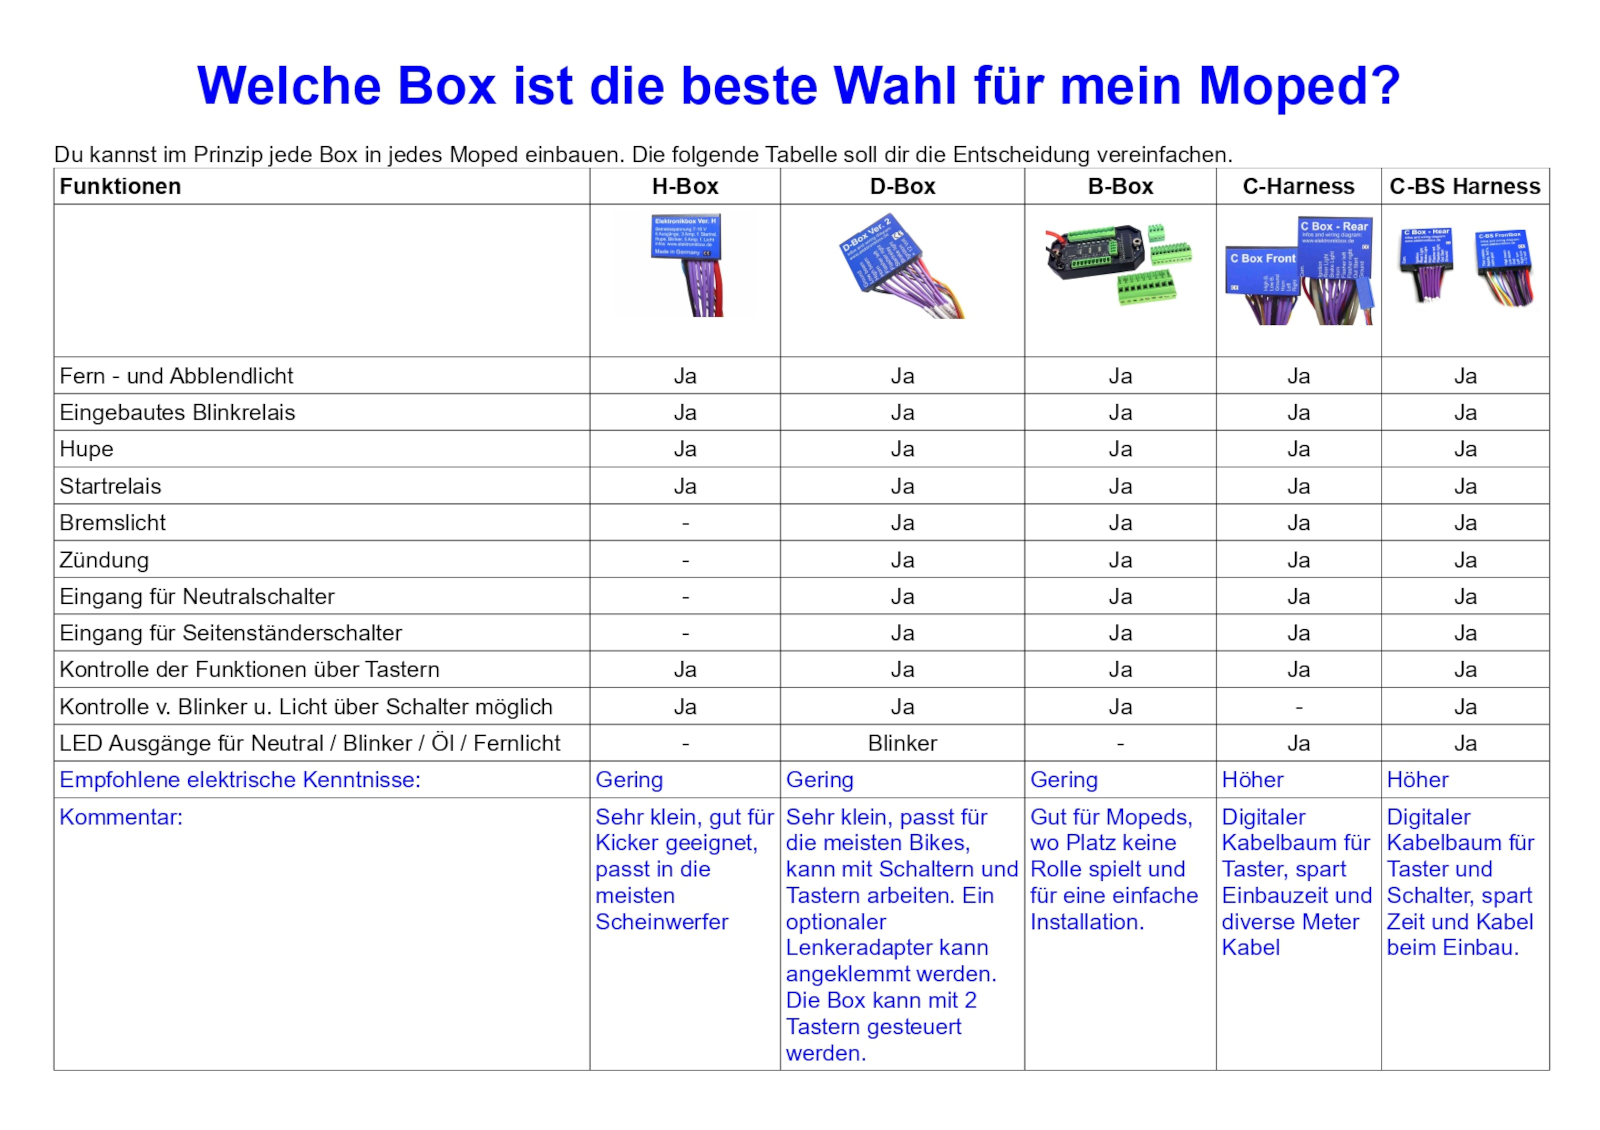 B-Box